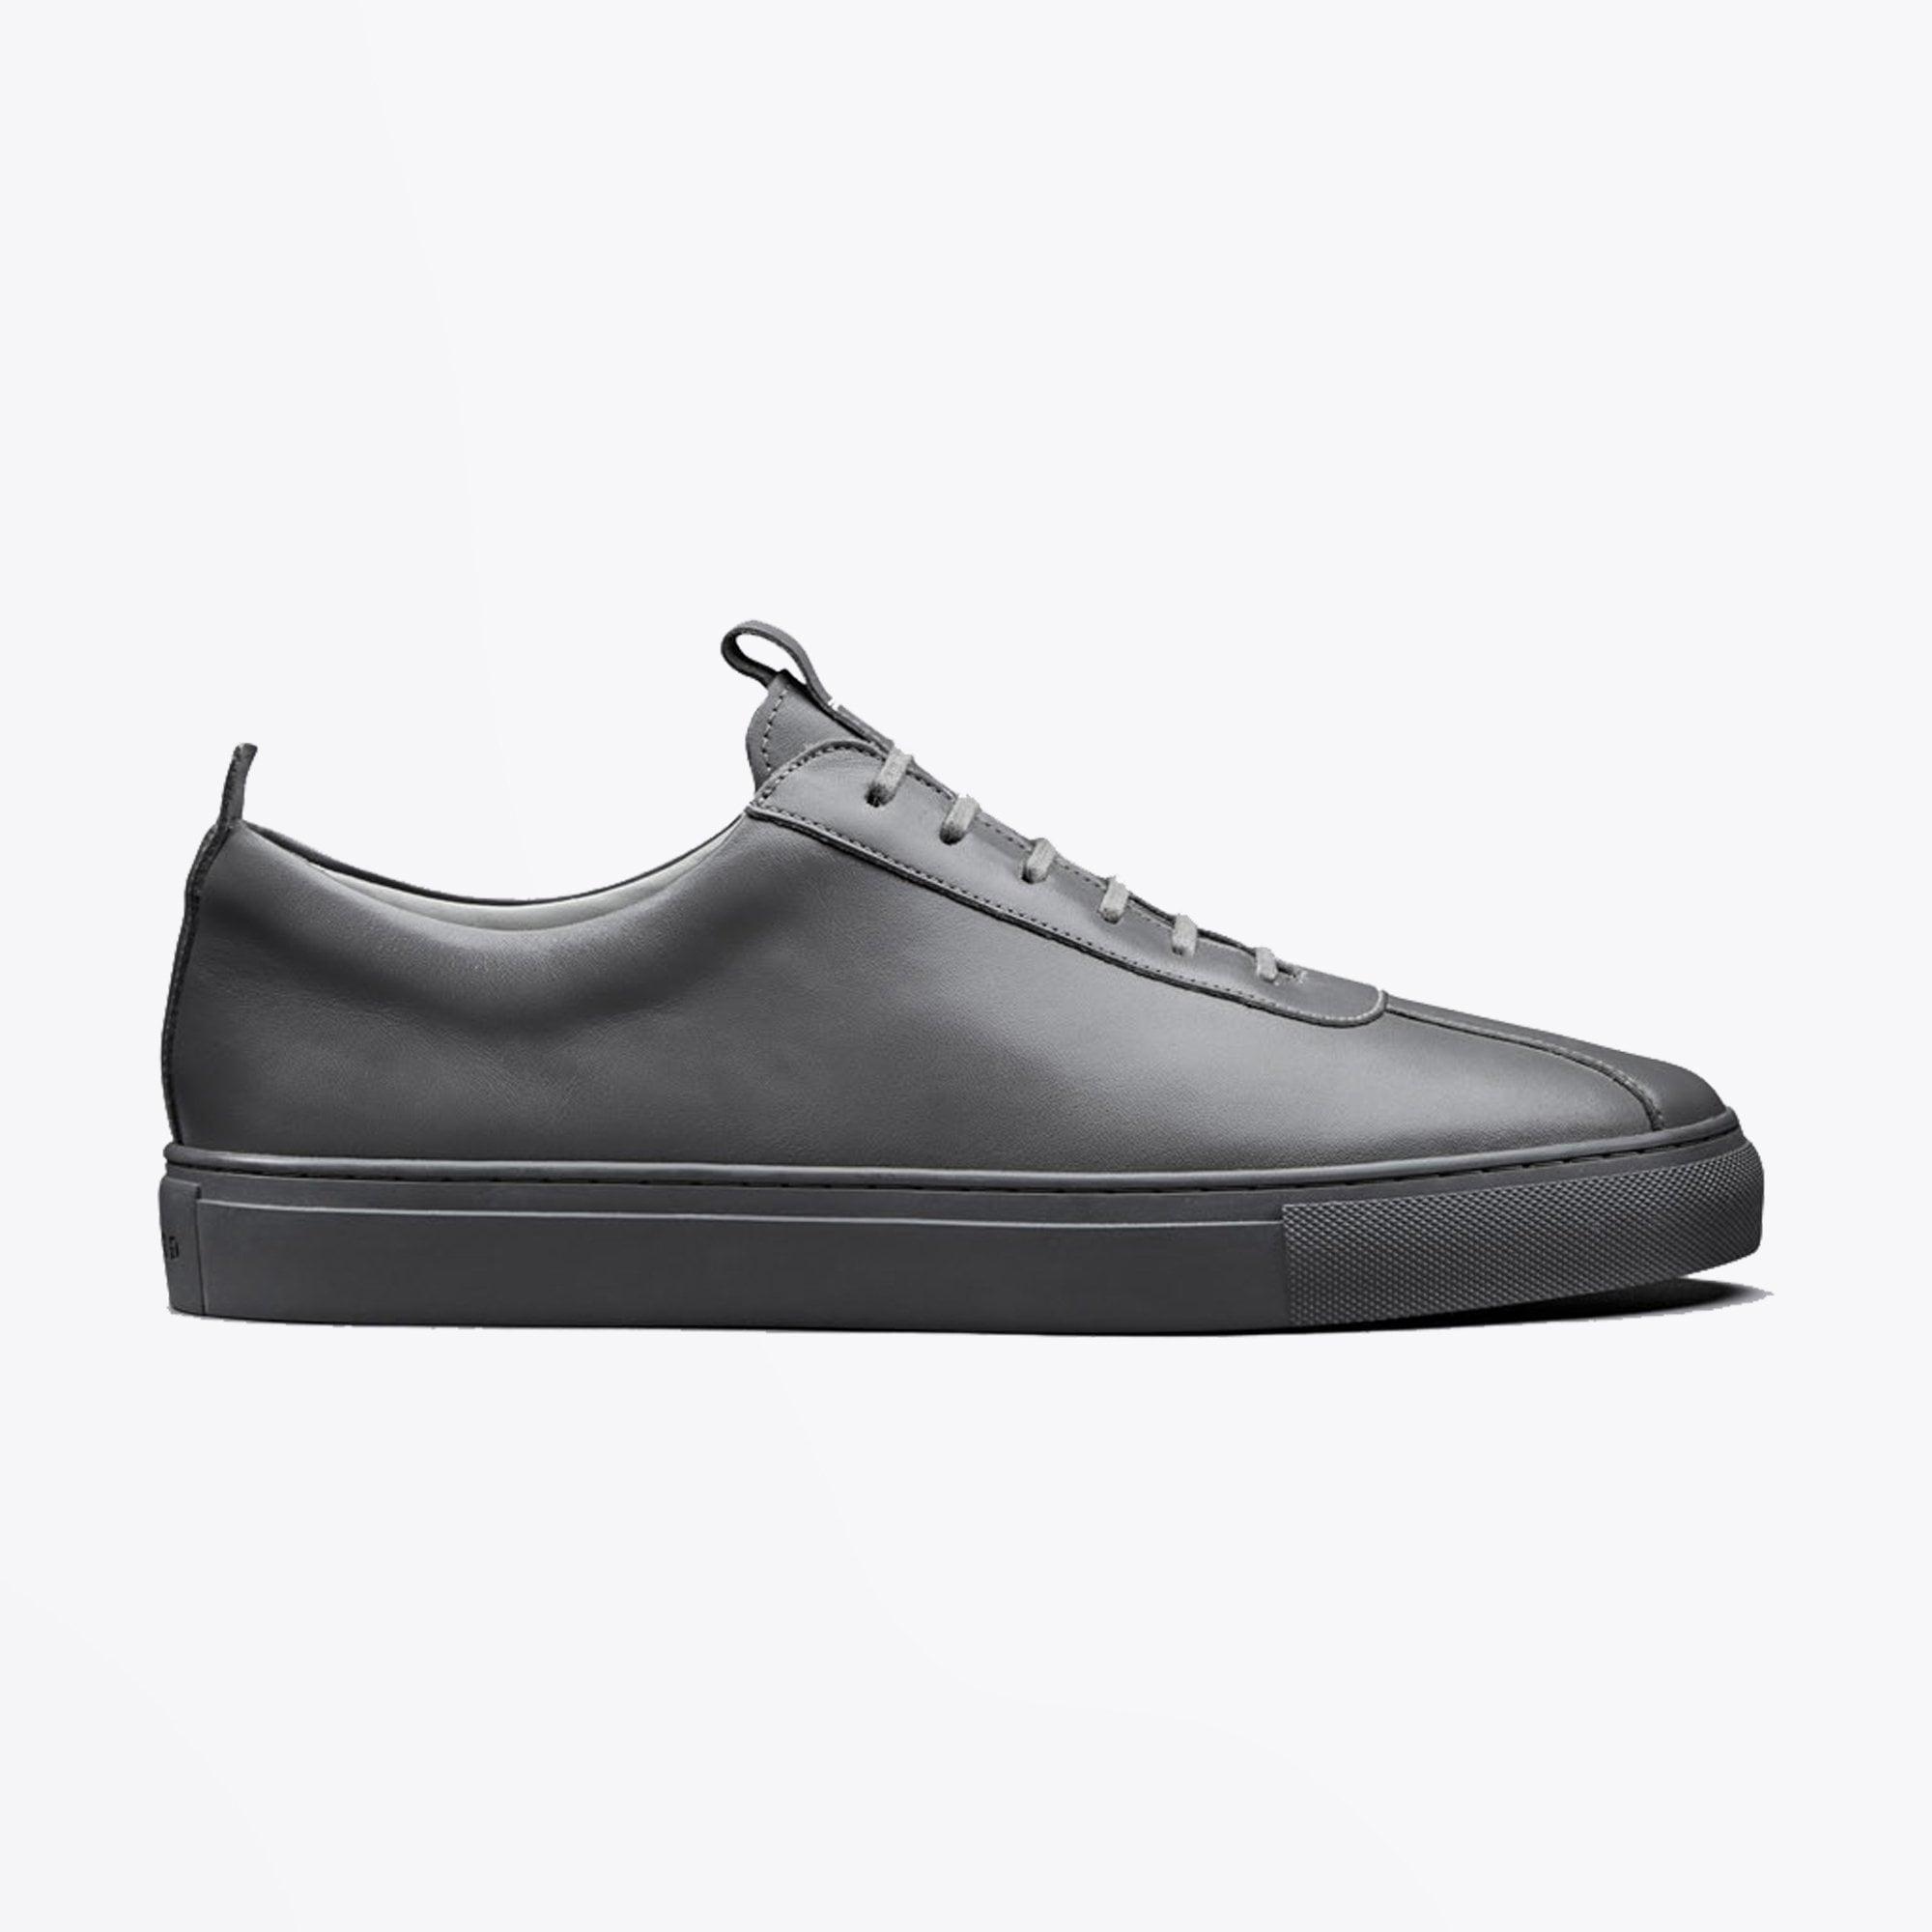 Grenson - Sneaker 1 - Leather Tennis